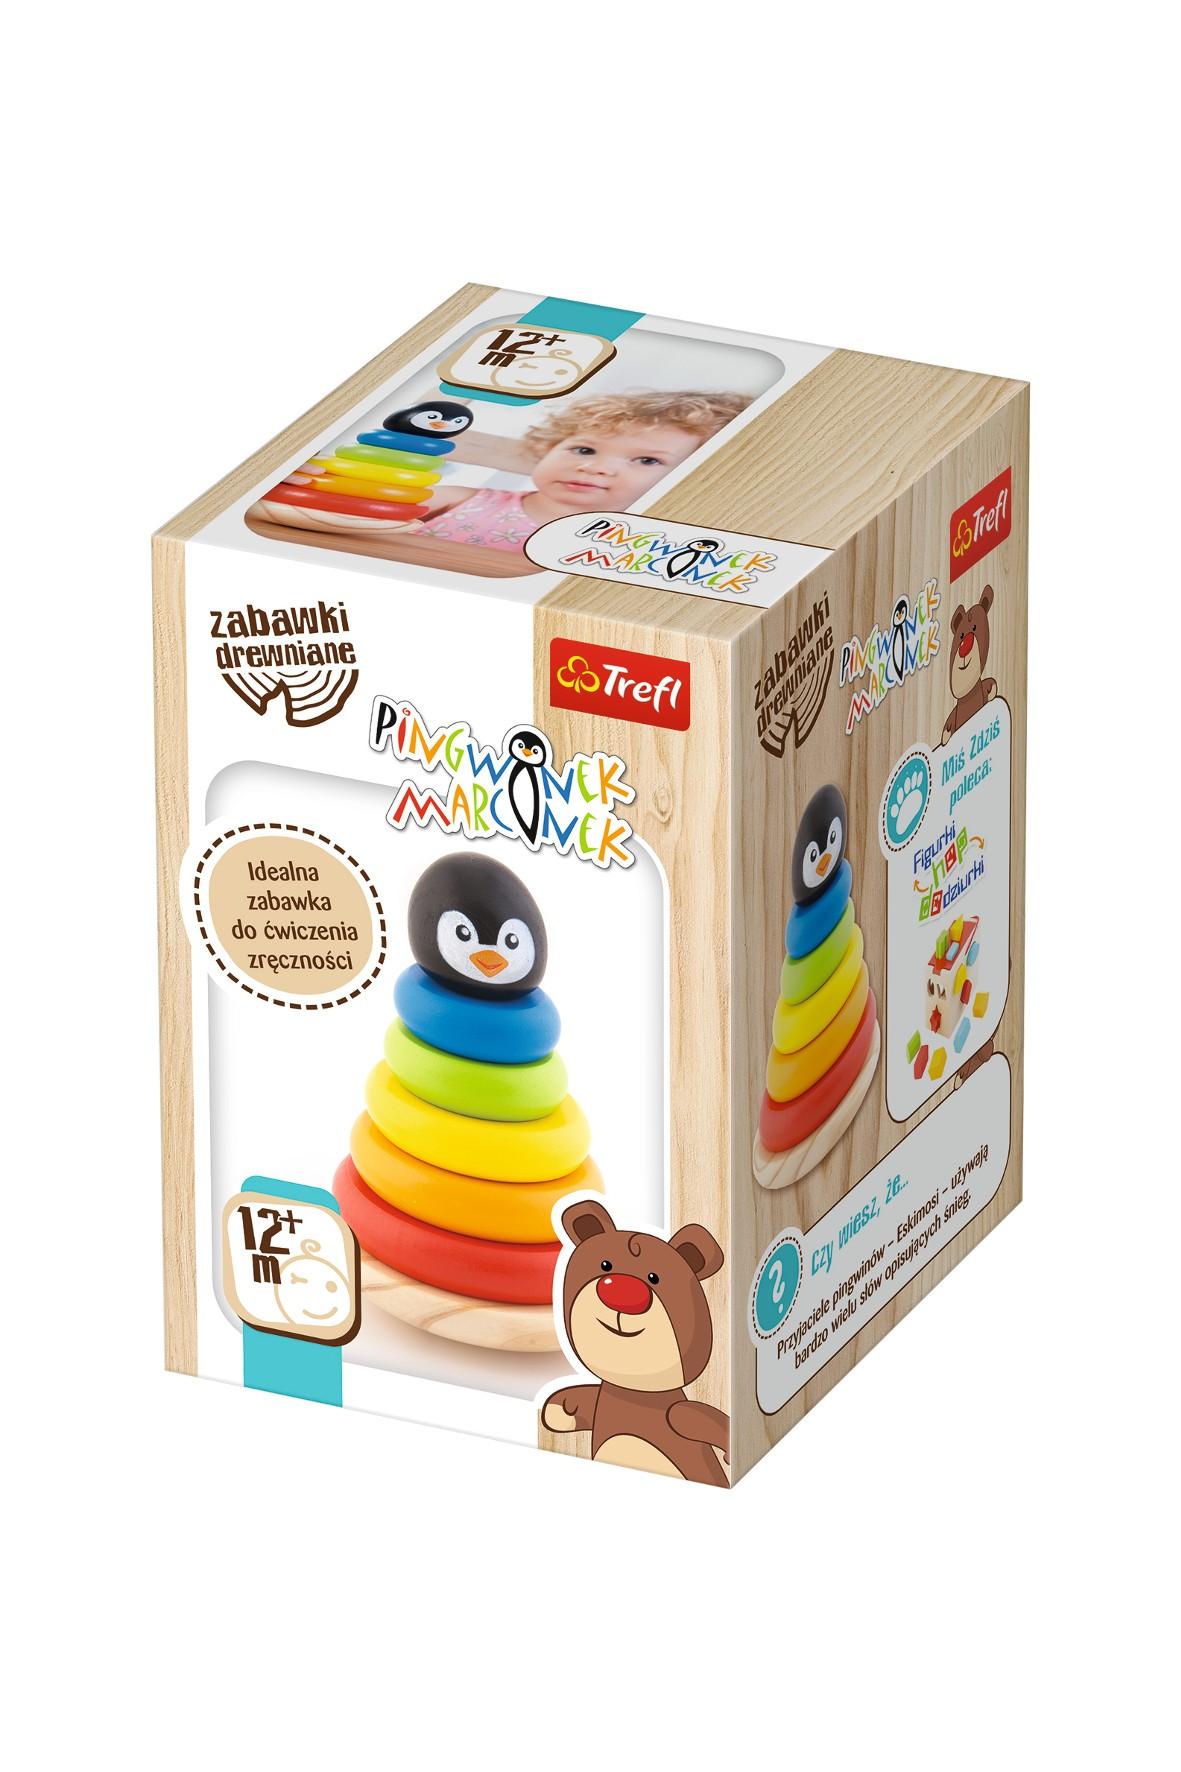 Pingwinek Marcinek- Zabawka drewniana sorter